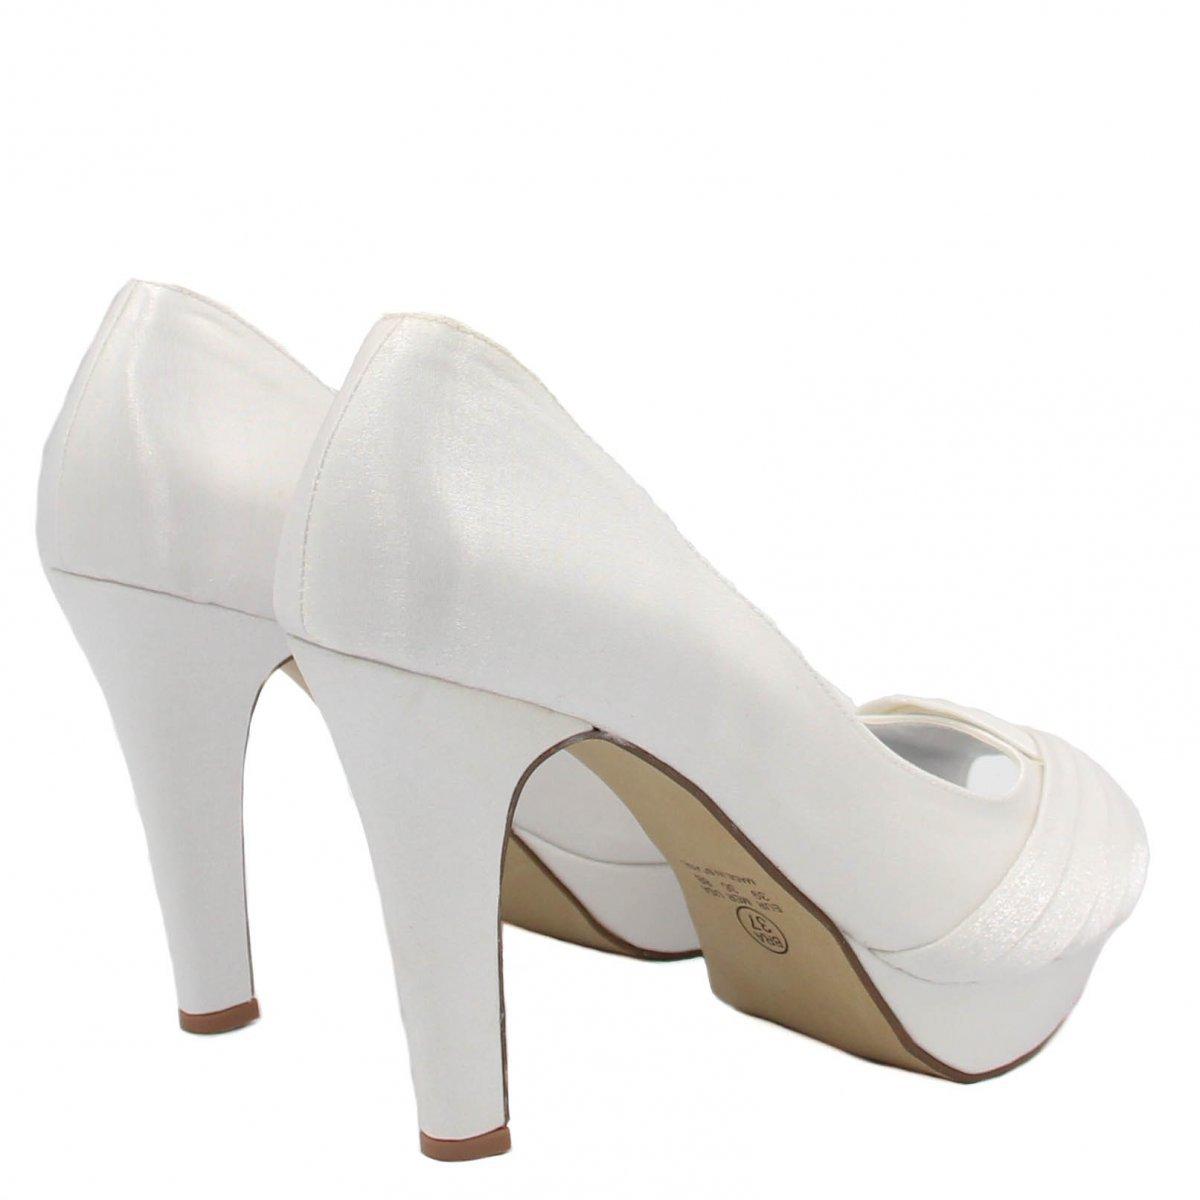 Feminino Salto Zariff Branco Peep Toe Toe Shoes Fino Peep Wwqv0WOBp